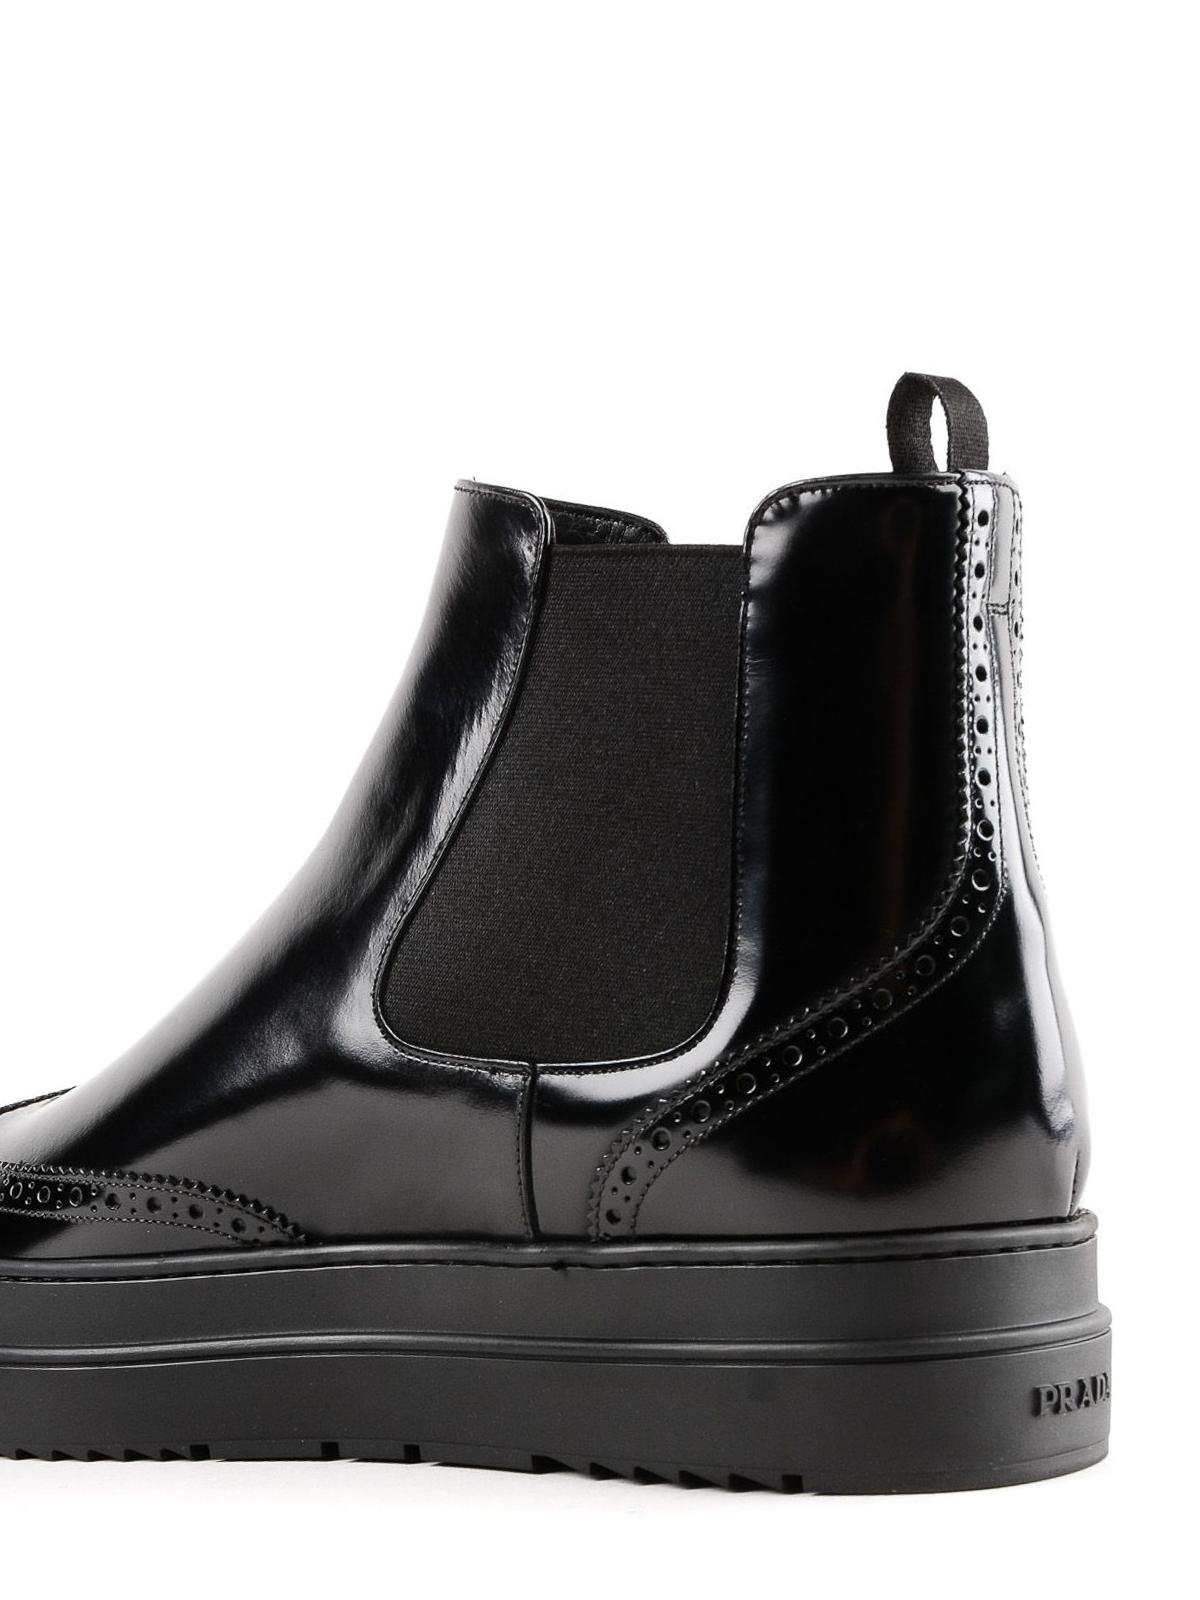 Brushed leather platform Chelsea boots